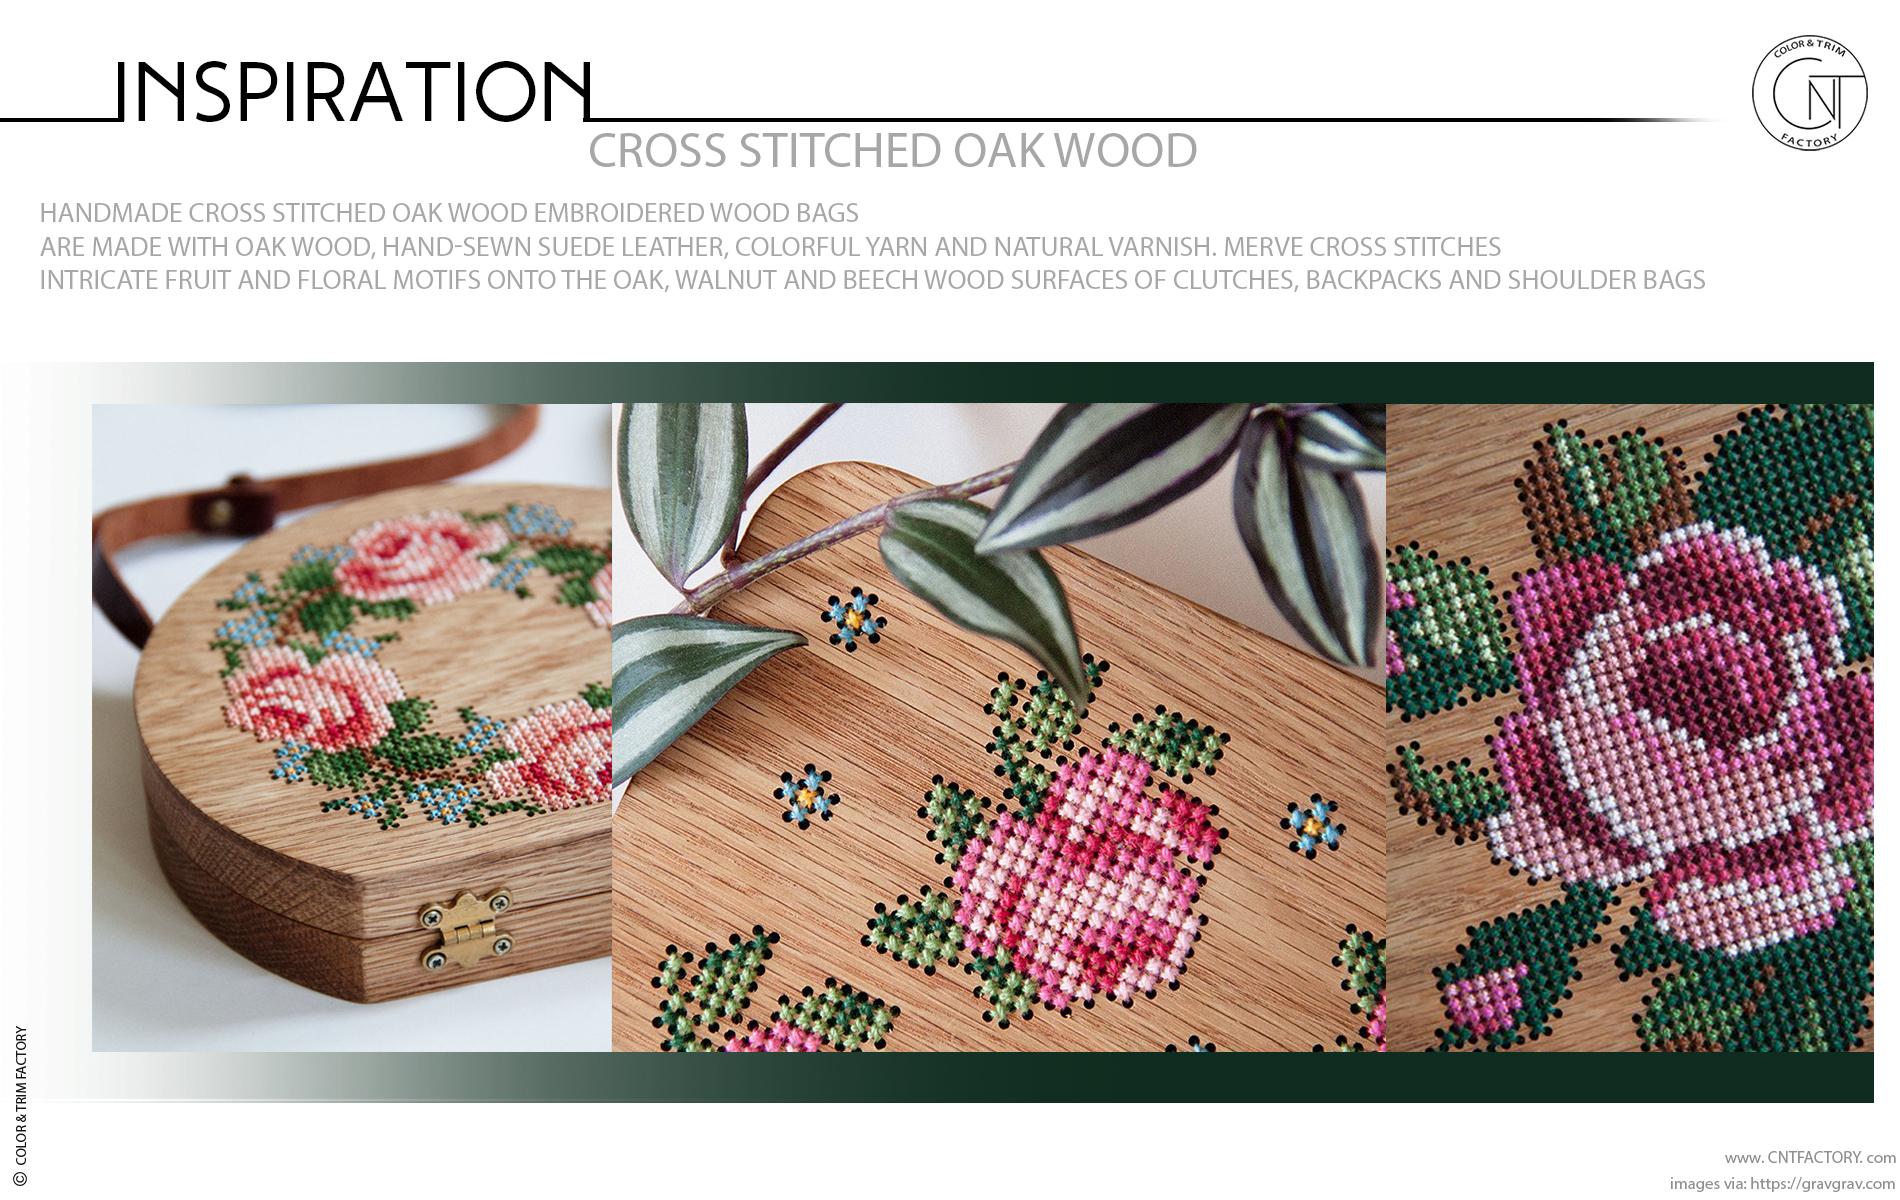 Handmade Cross Stitched Oak Wood Embroidered Wood